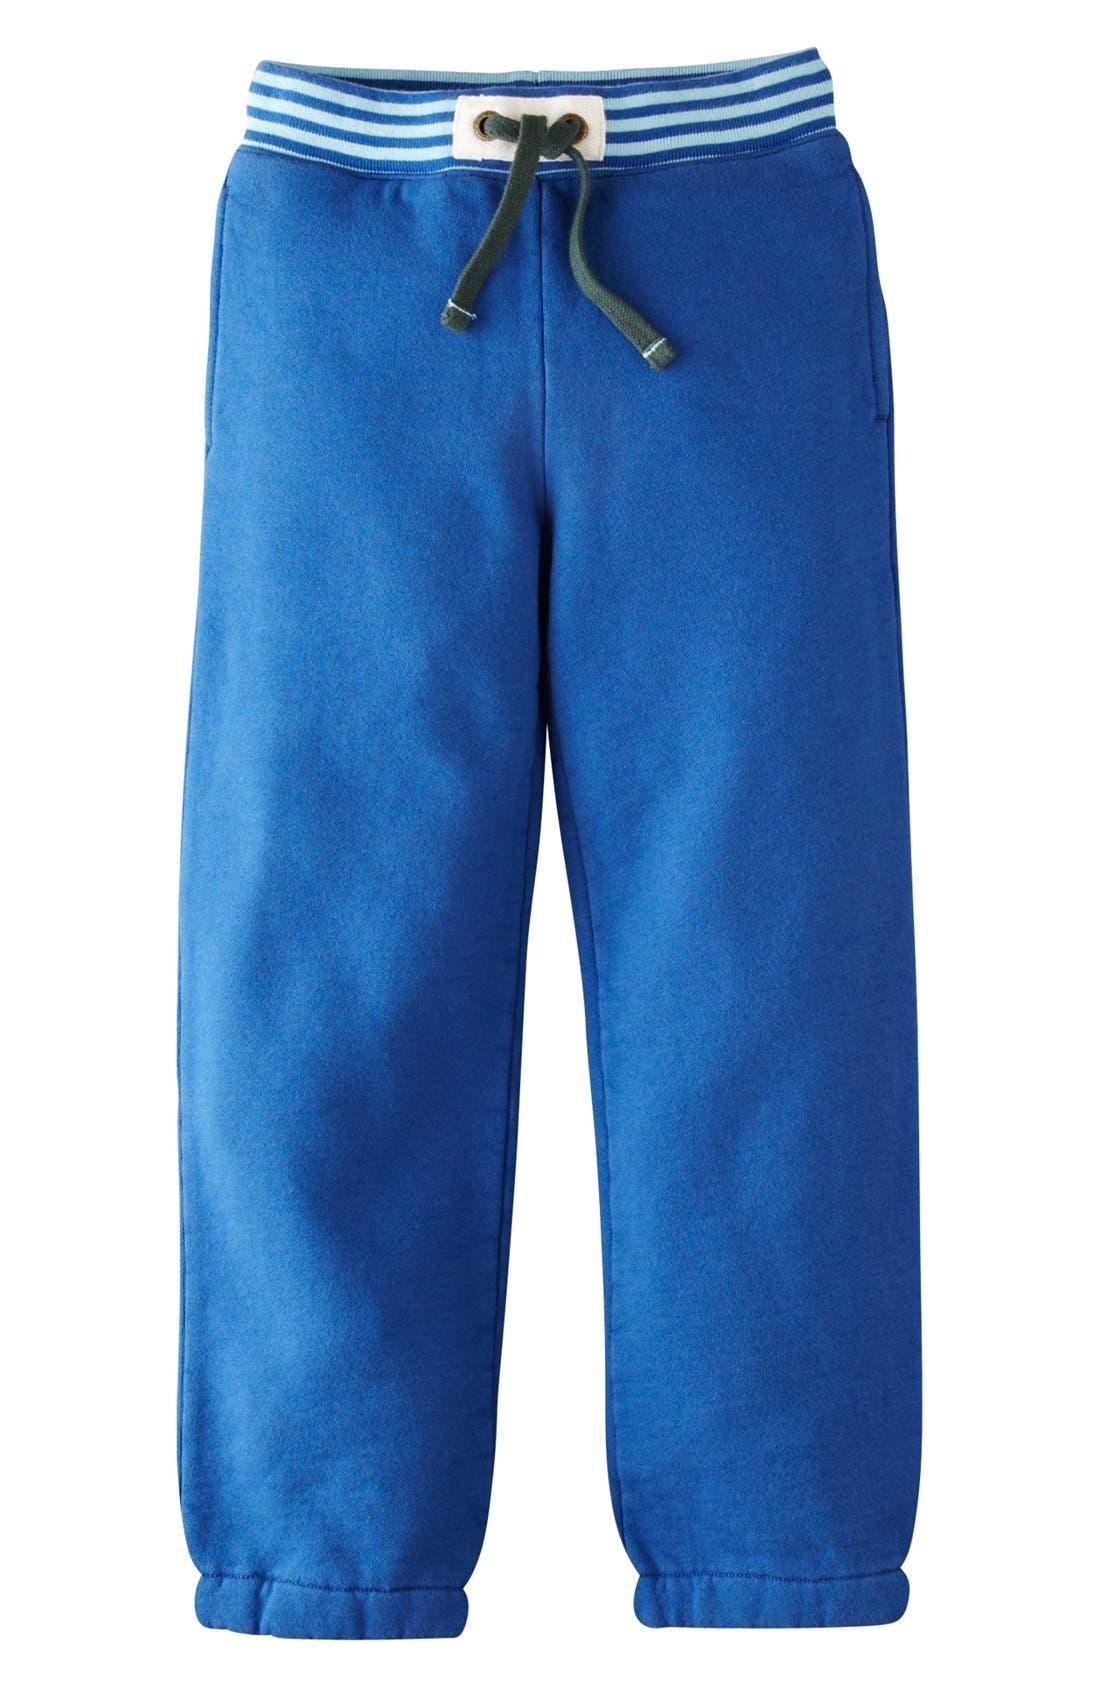 Alternate Image 1 Selected - Mini Boden Track Pants (Toddler Boys, Little Boys & Big Boys)